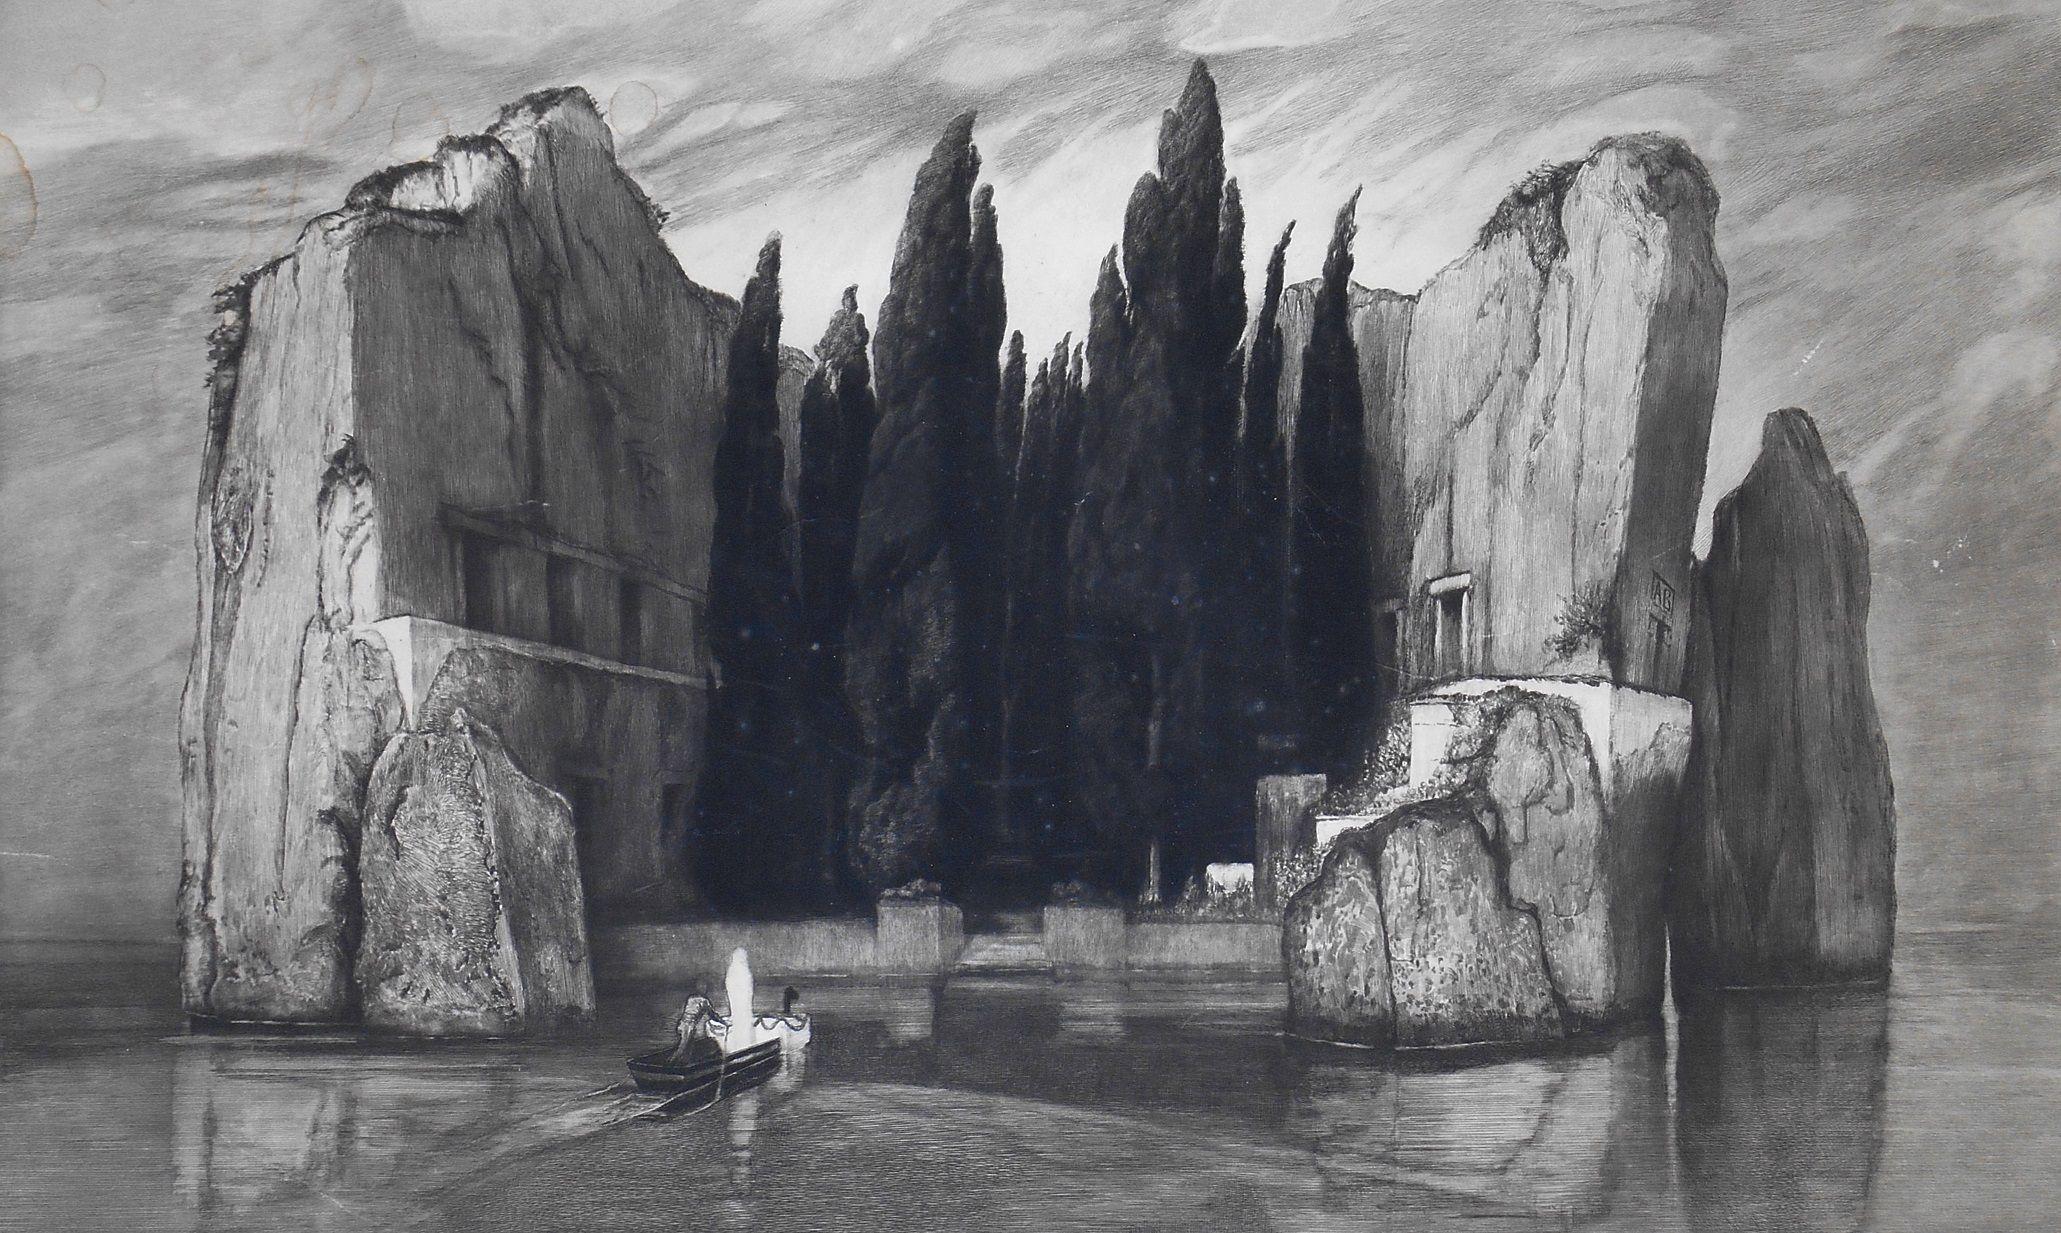 Max Klinger, Isola dei Morti - 1898 - Acquaforte, acquatinta